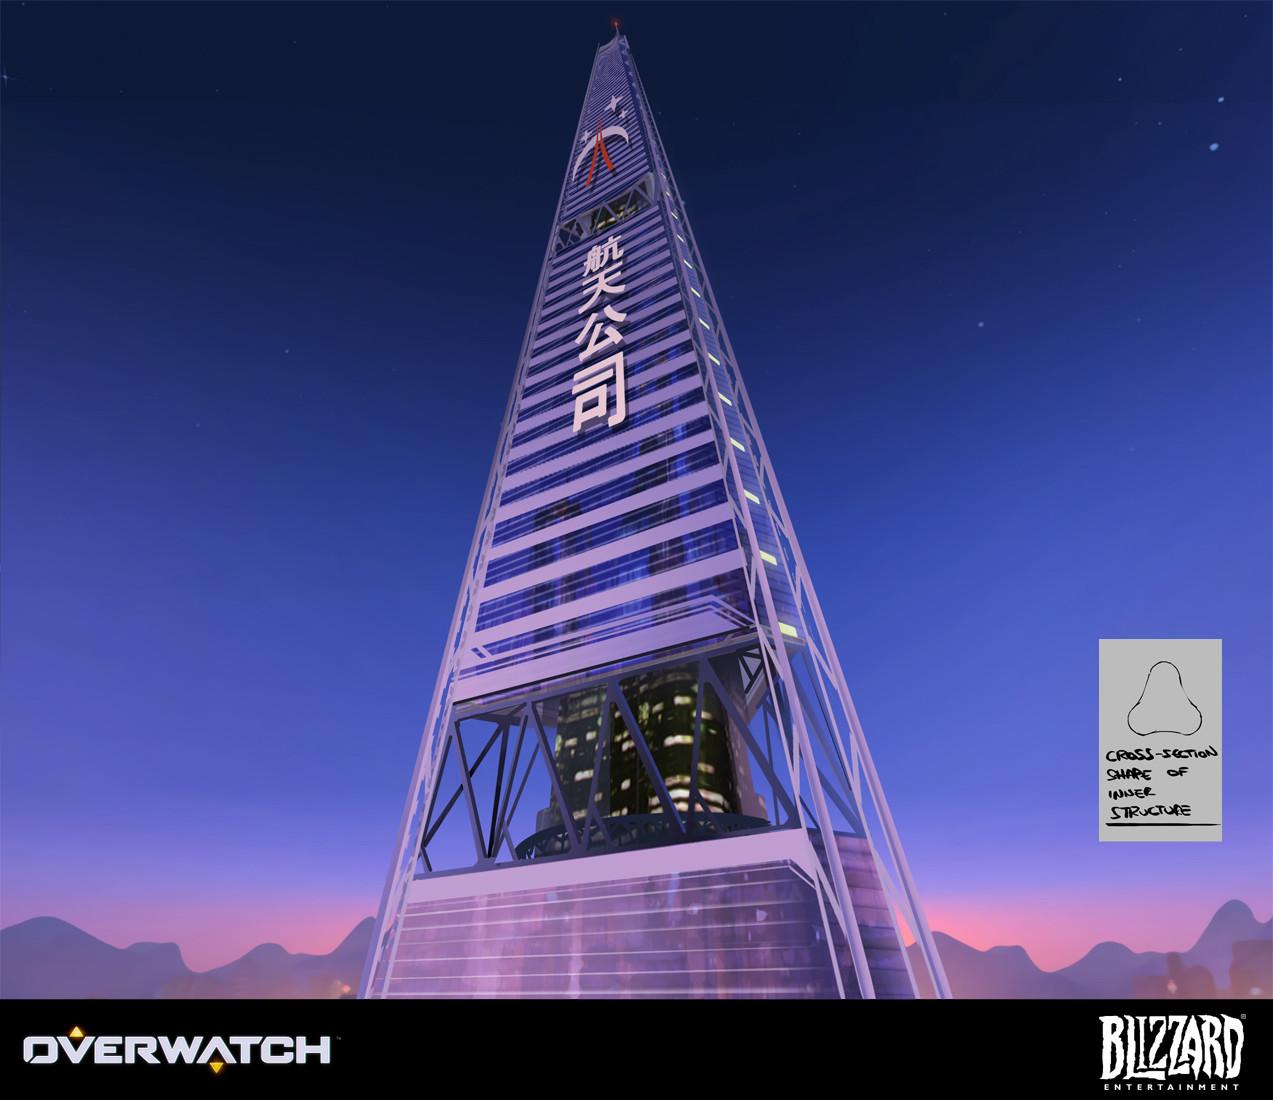 Overwatch Artwork by Nick Carver